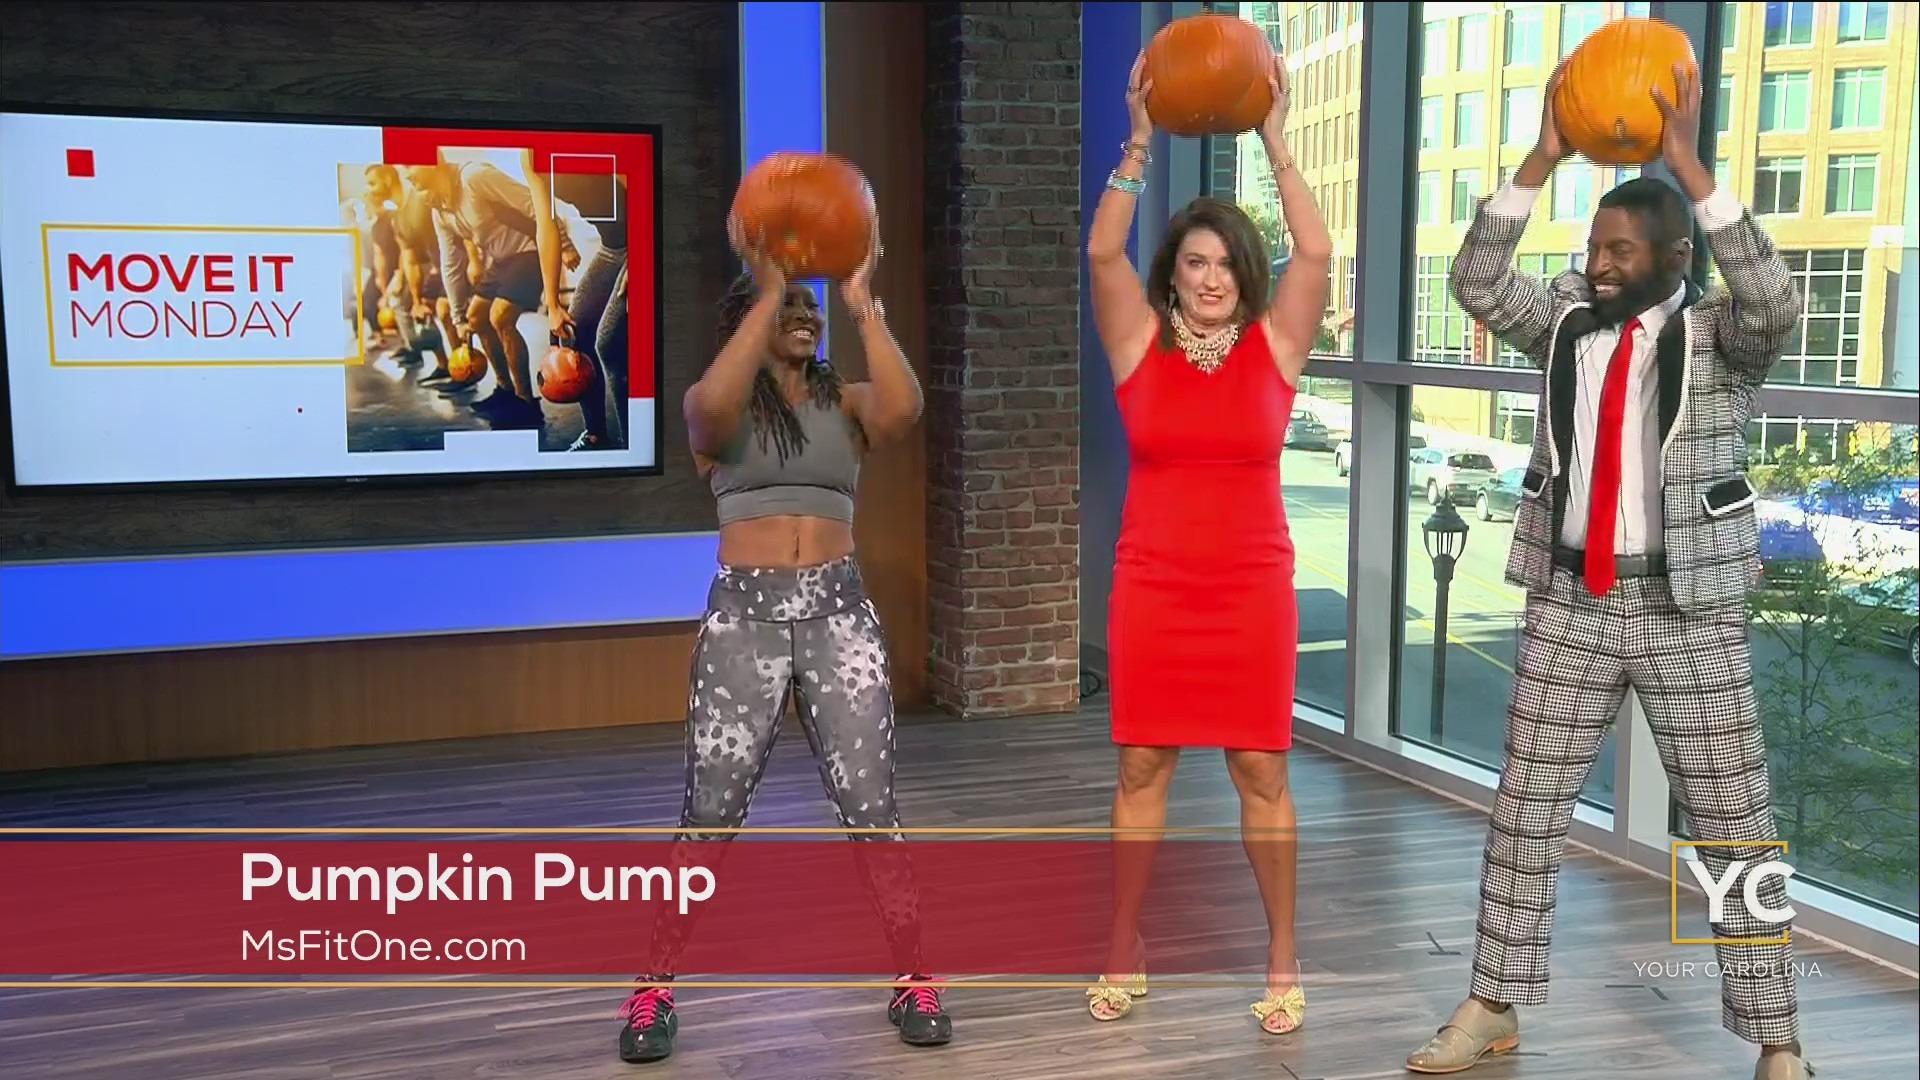 Move It Monday - Pumpkin Pump Full Body Workout